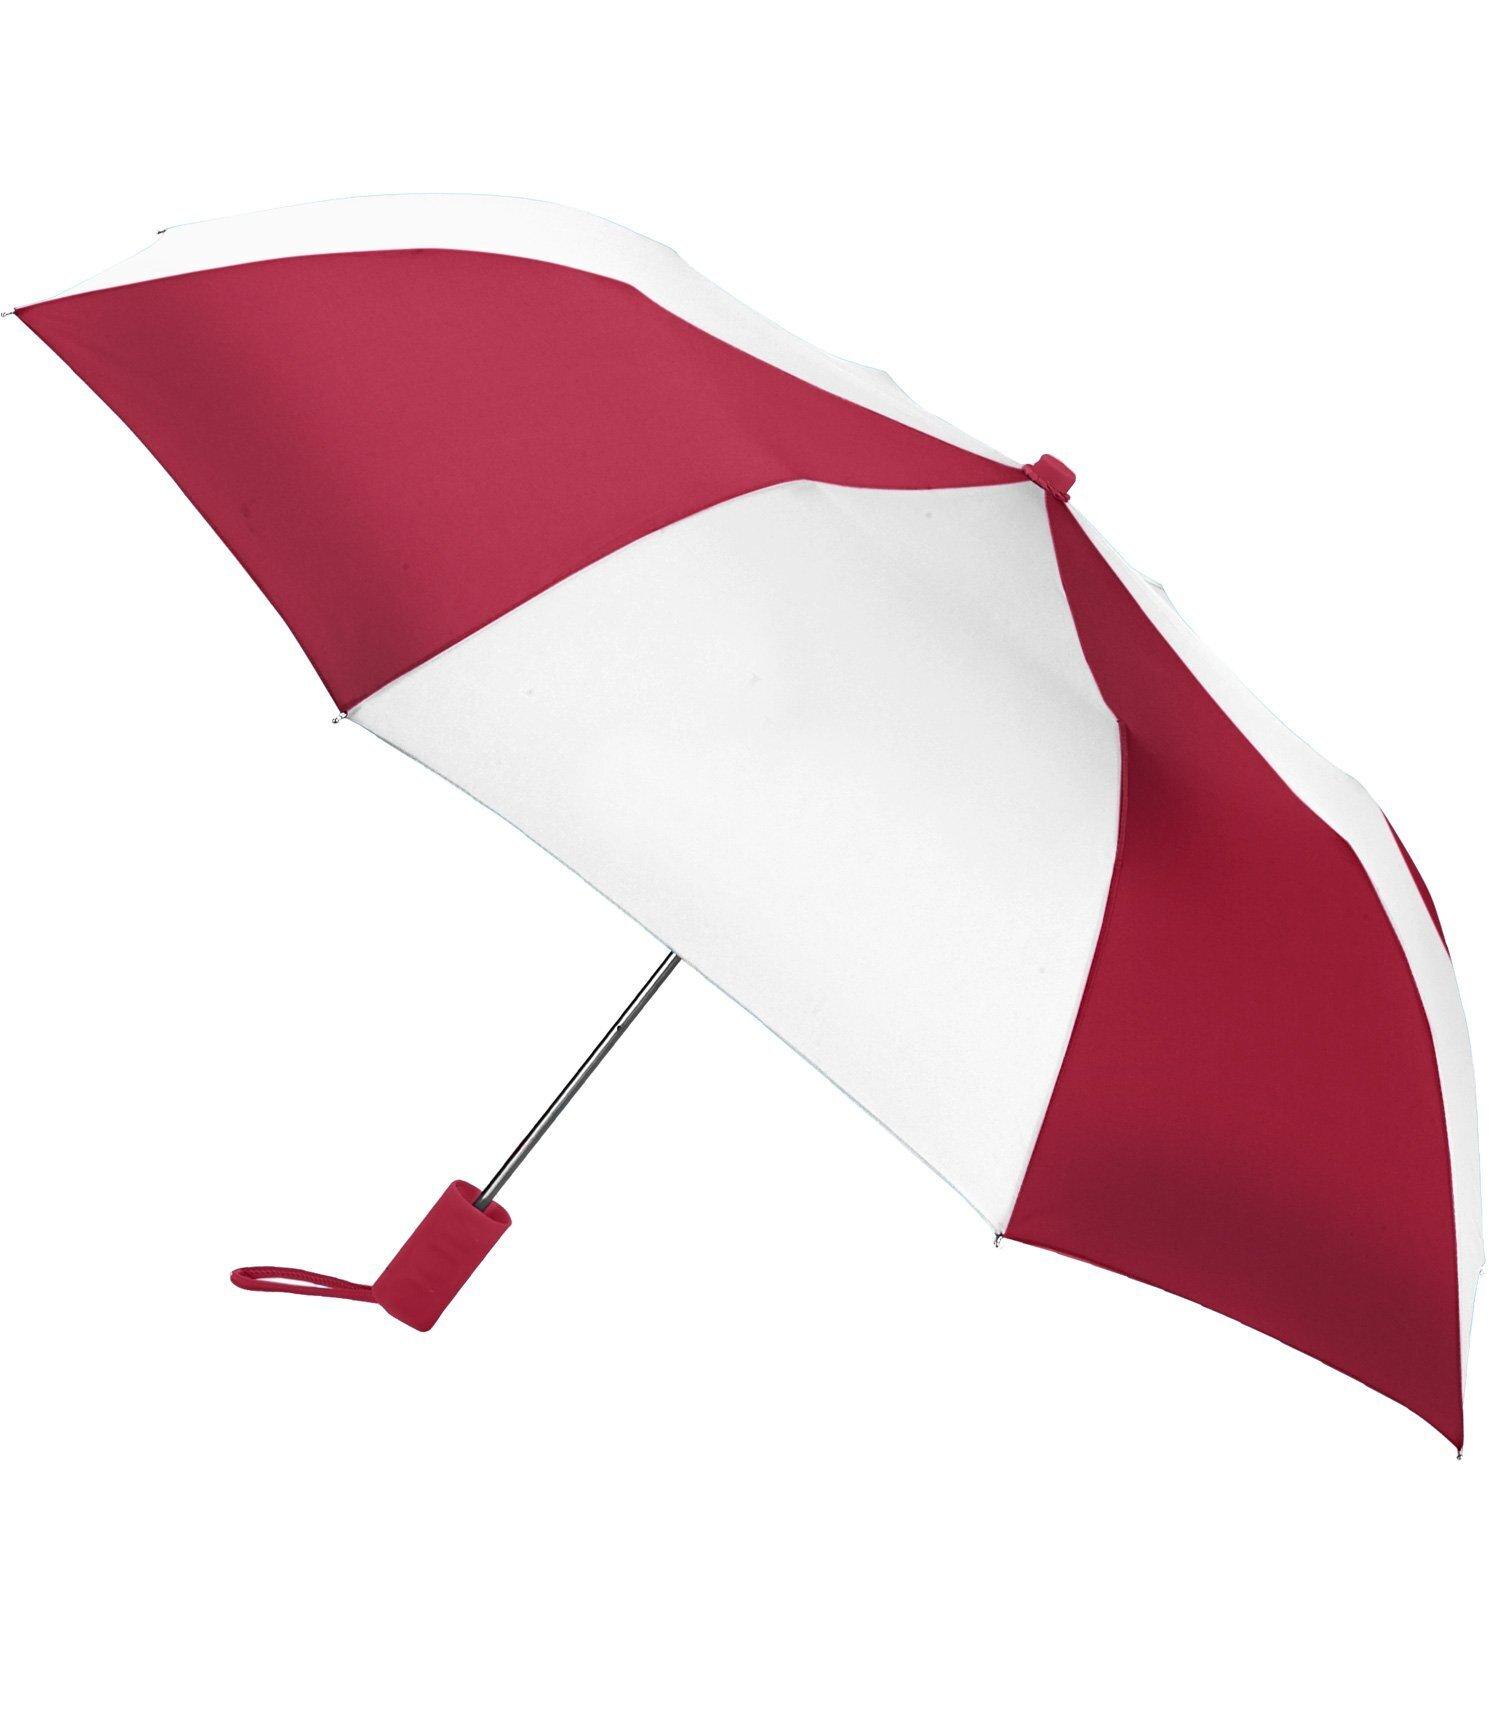 "Folding Automatic Open Umbrella, 42"" Arc"